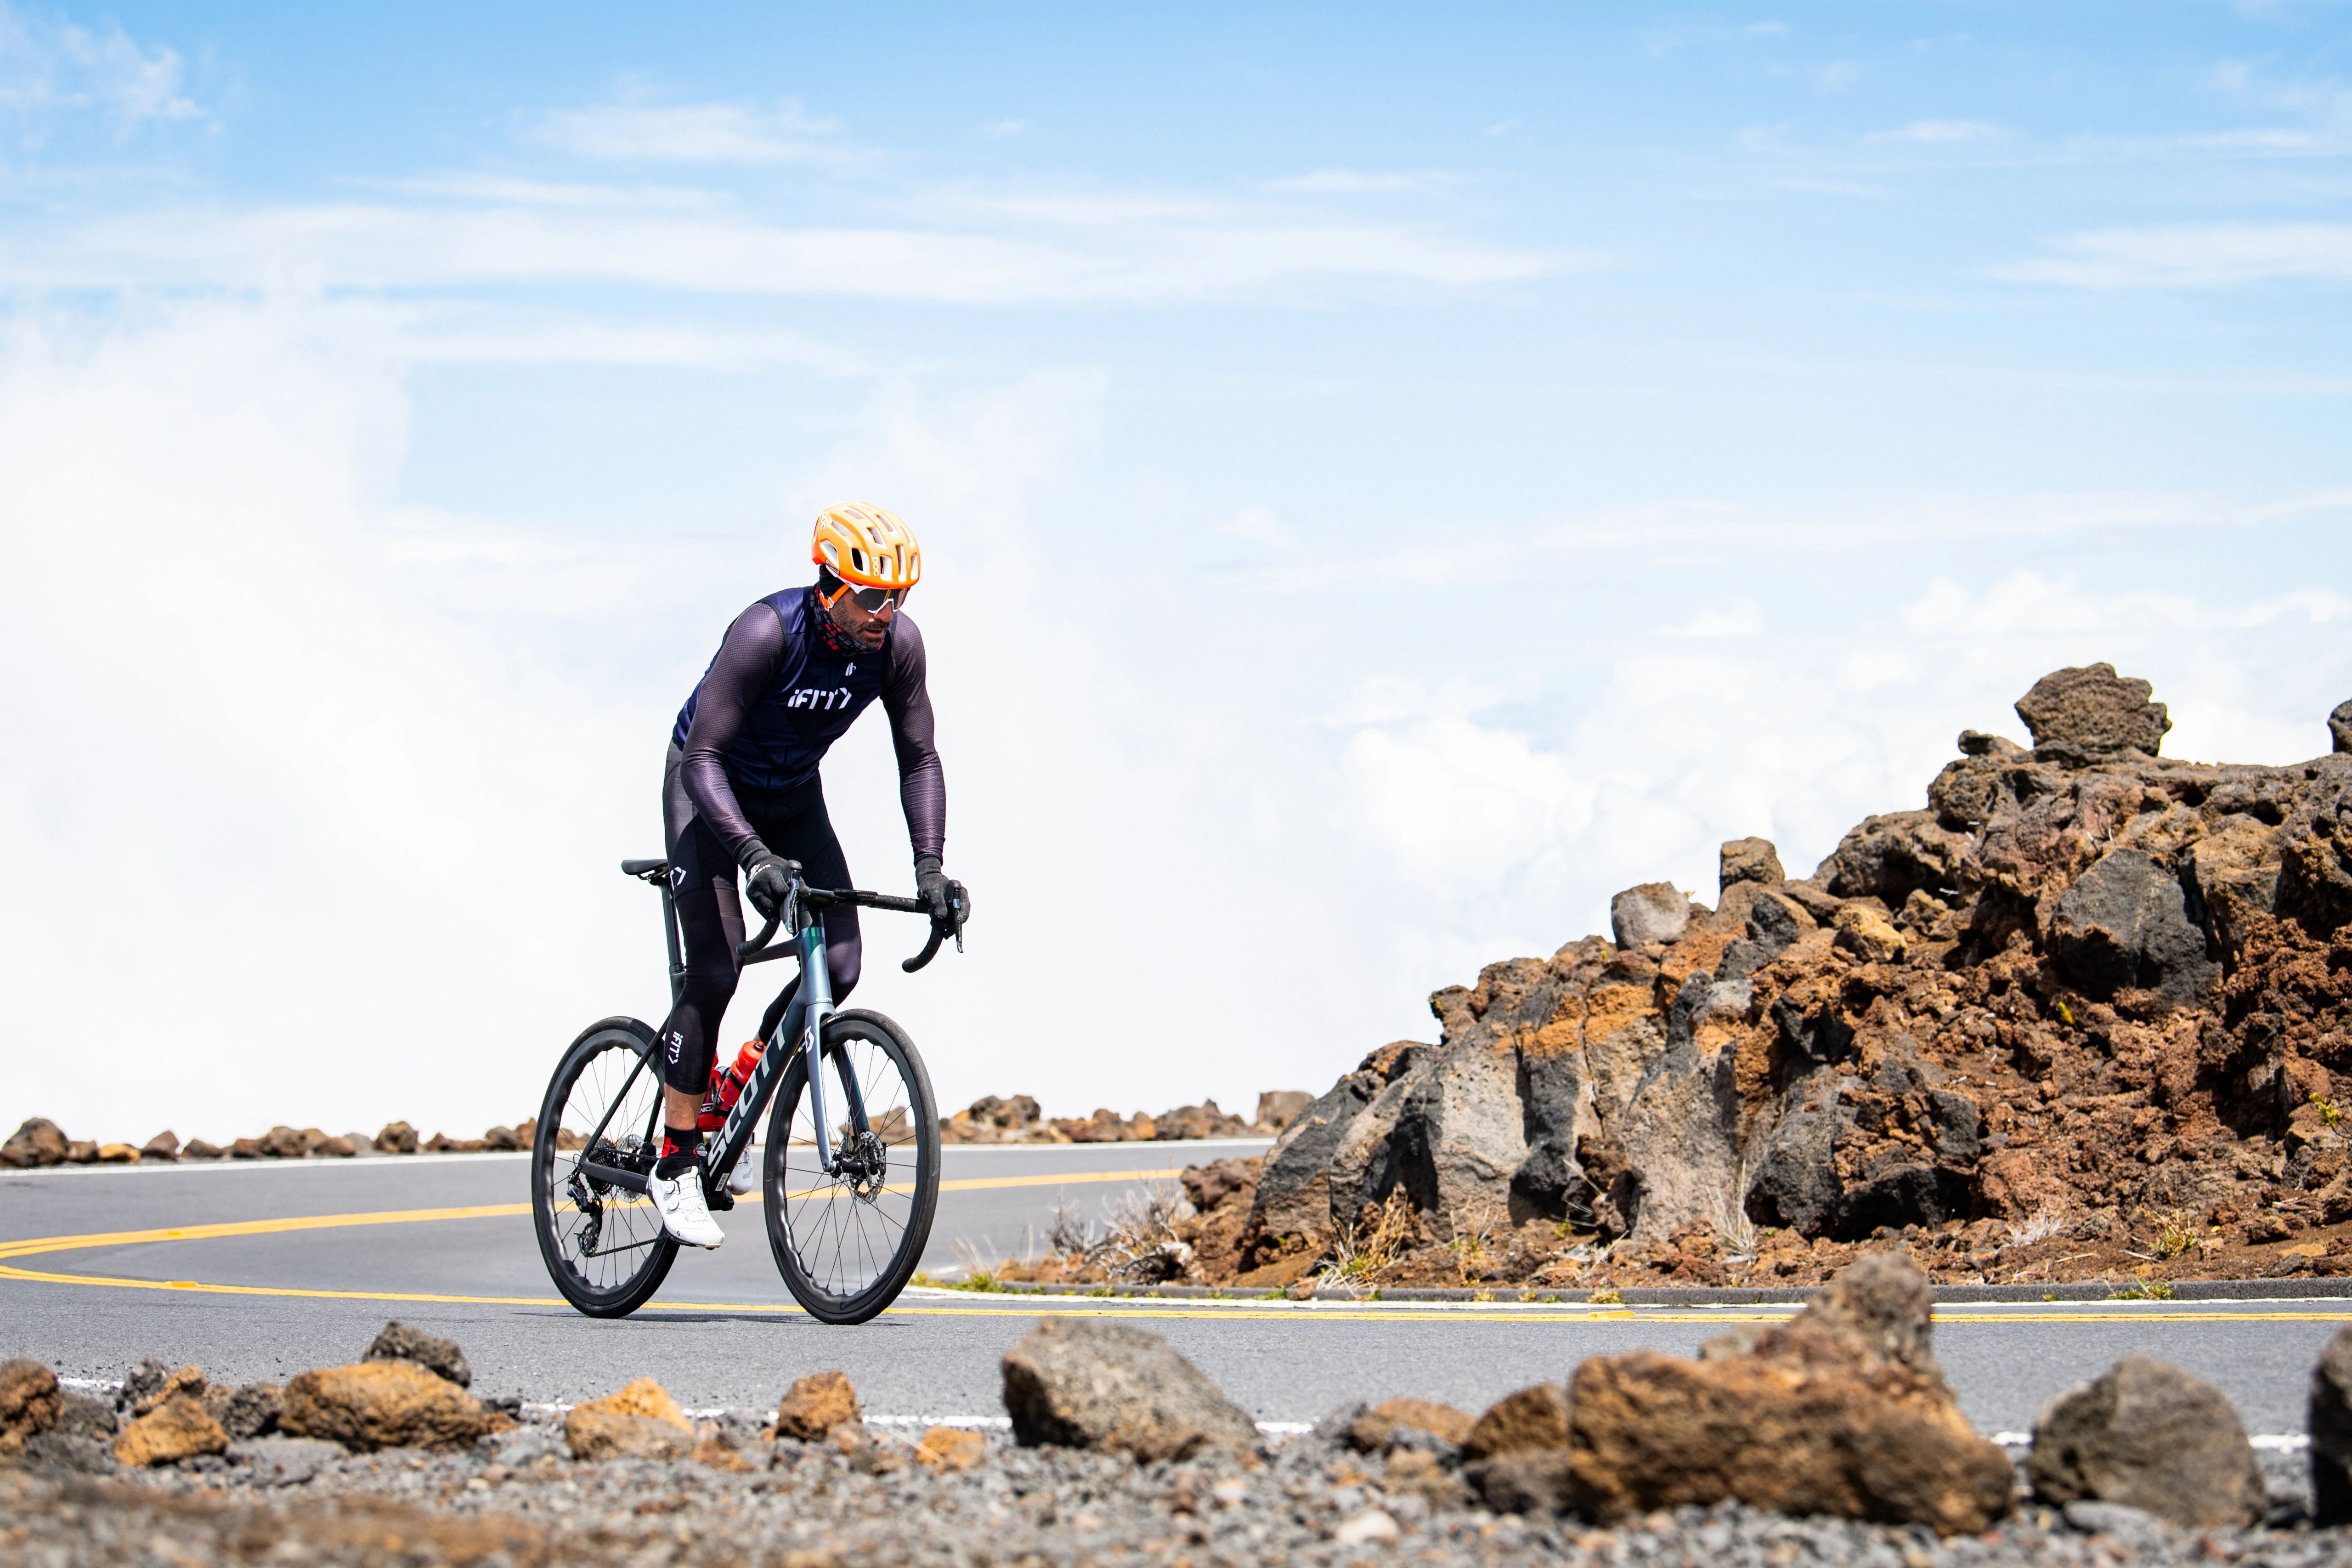 Man riding a bicycle a road bike outside